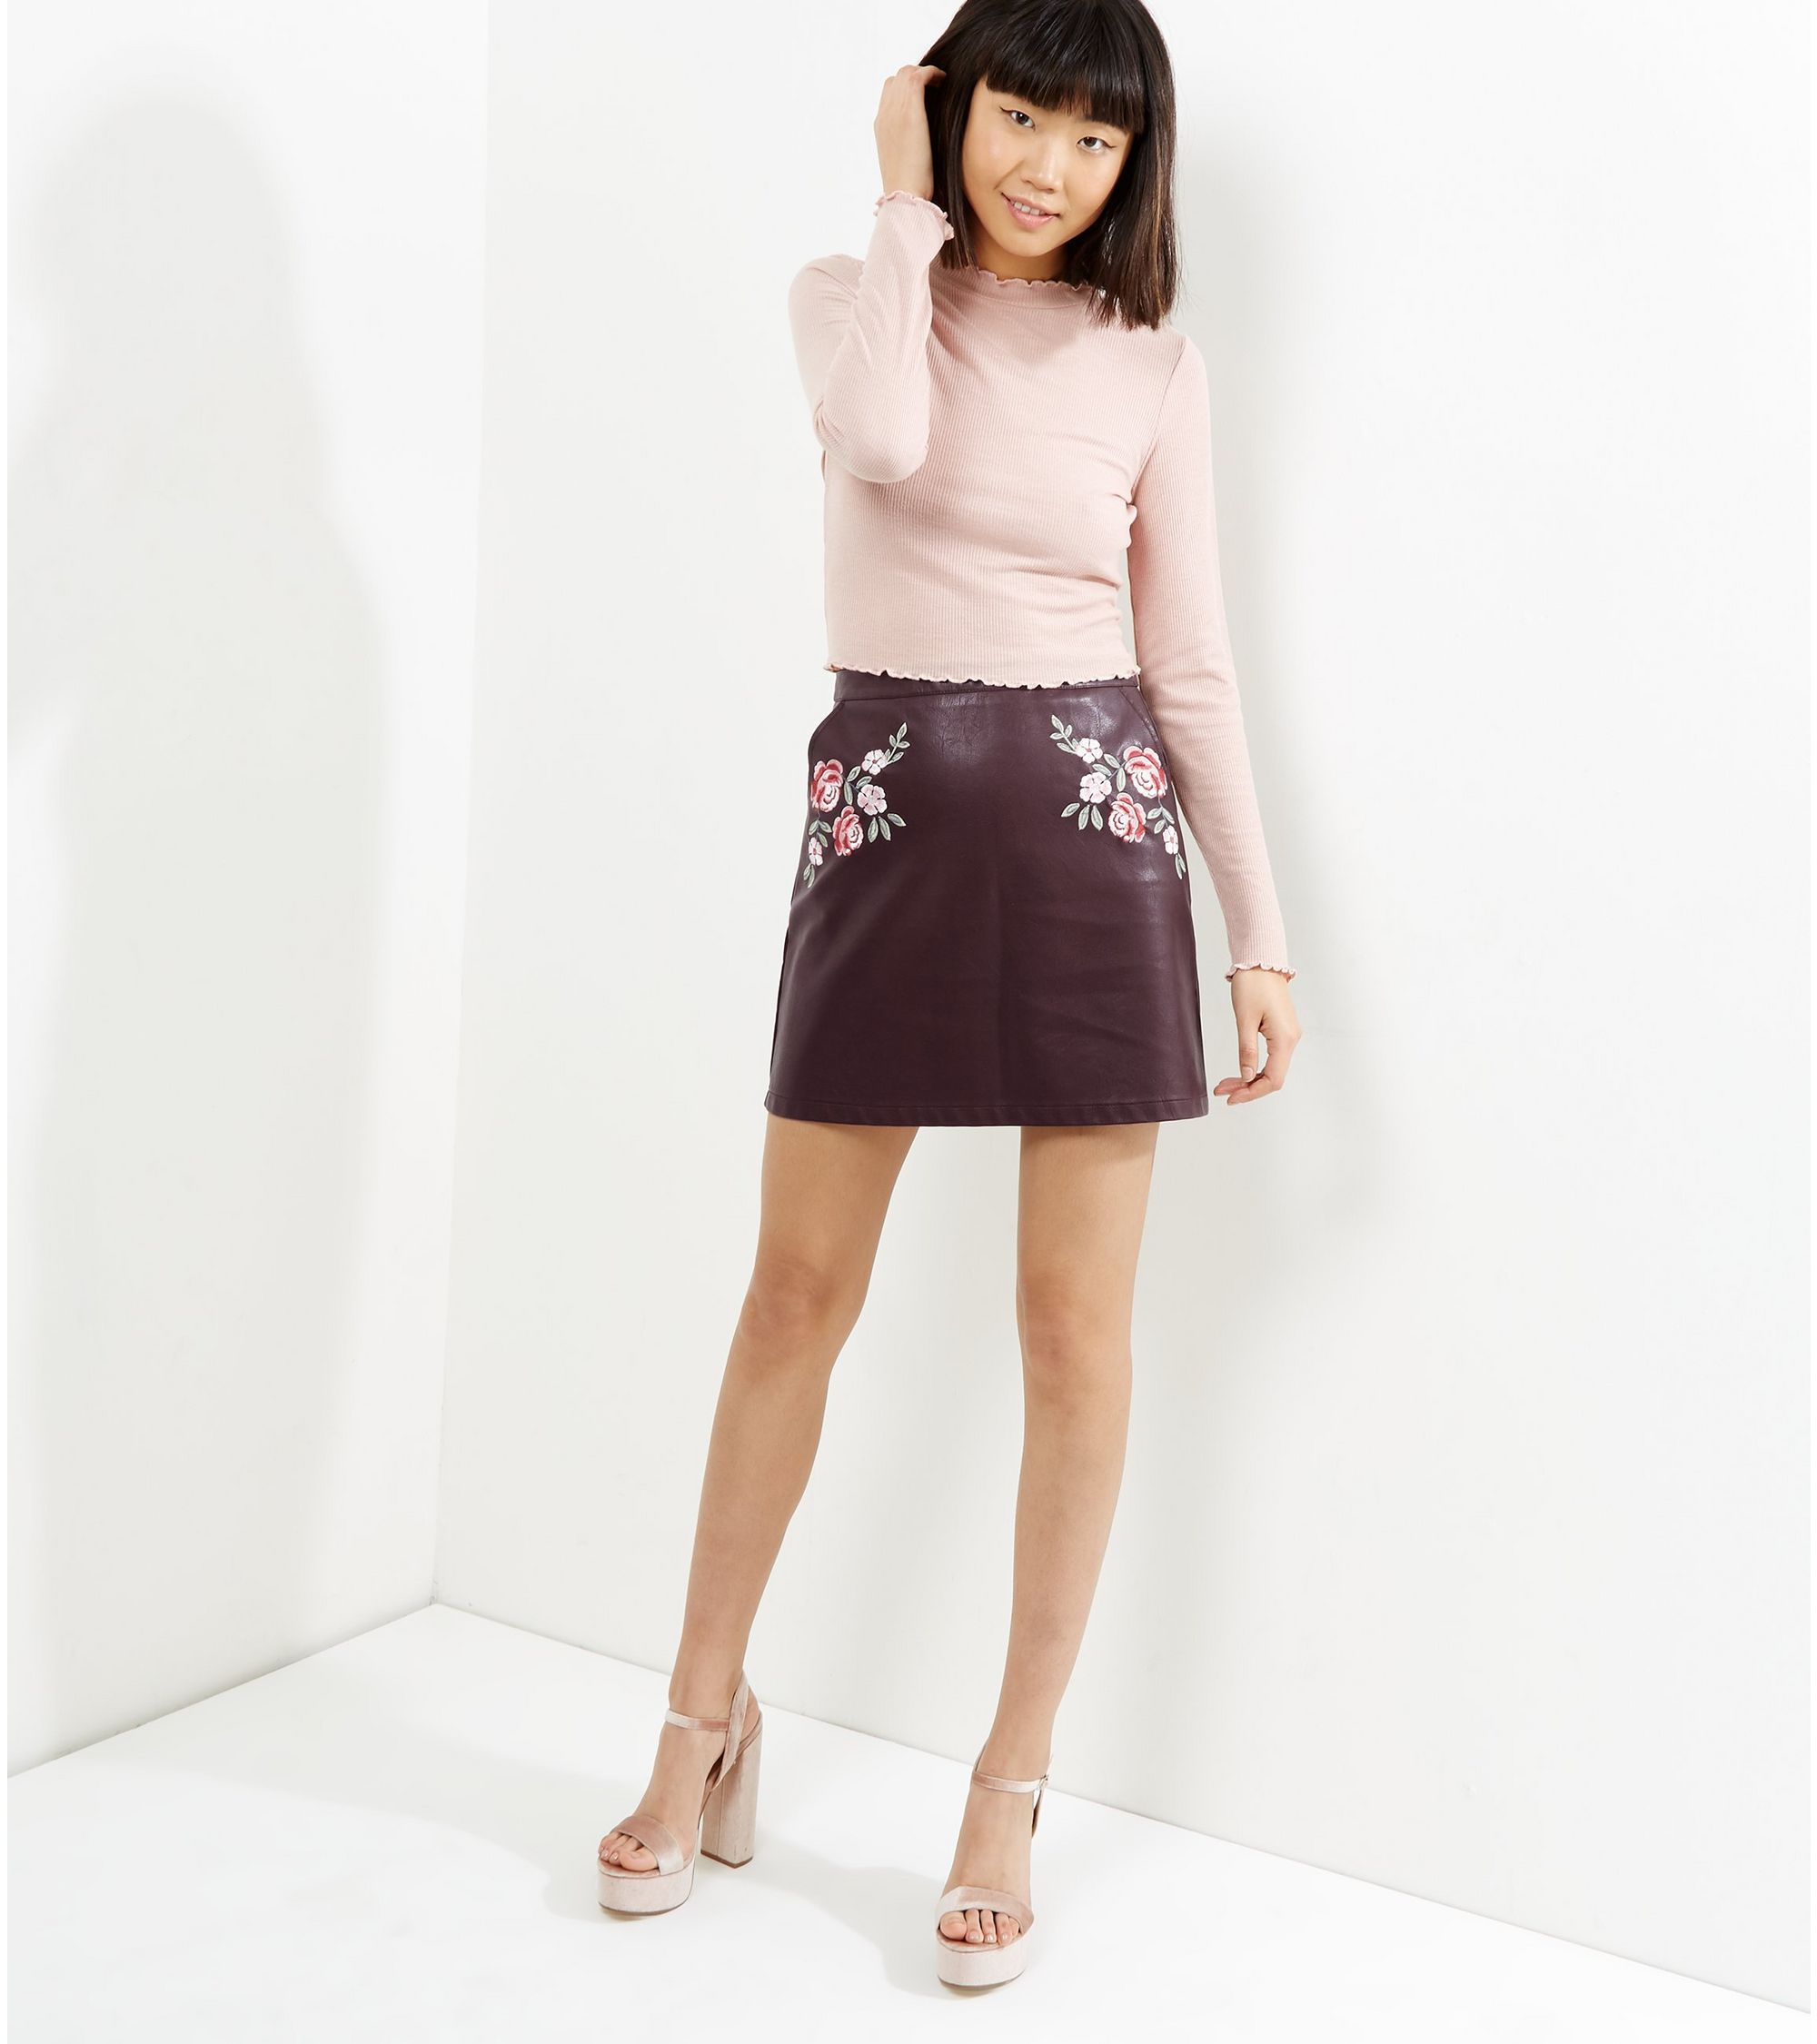 cc85326b2 New Look Burgundy Leather Skirt